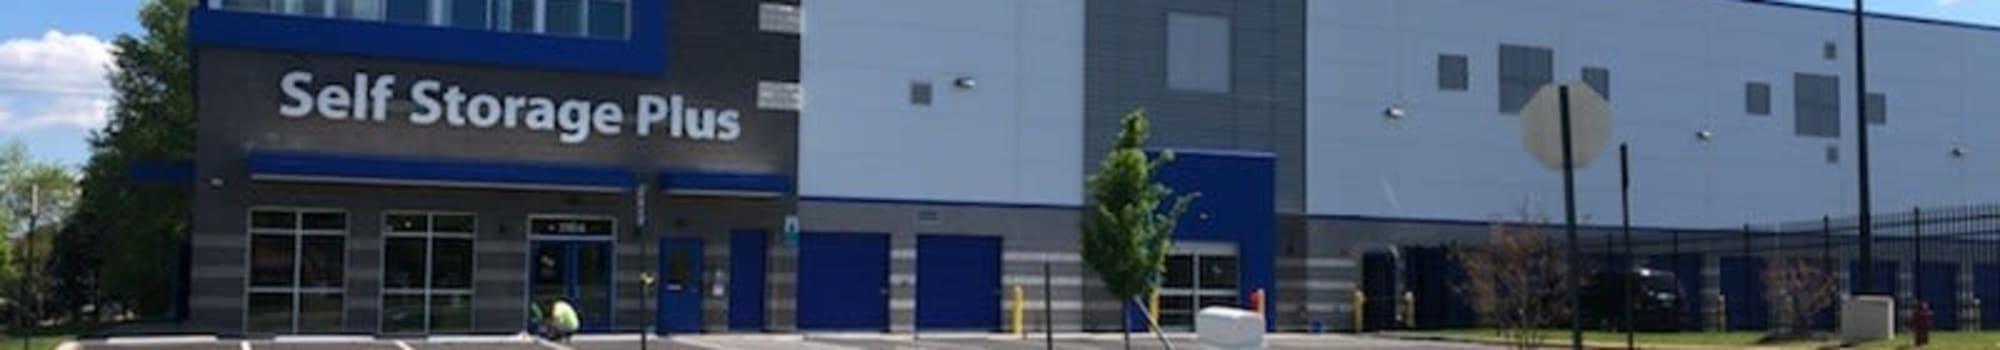 Self Storage Plus in Fredericksburg, Virginia offering climate-controlled storage